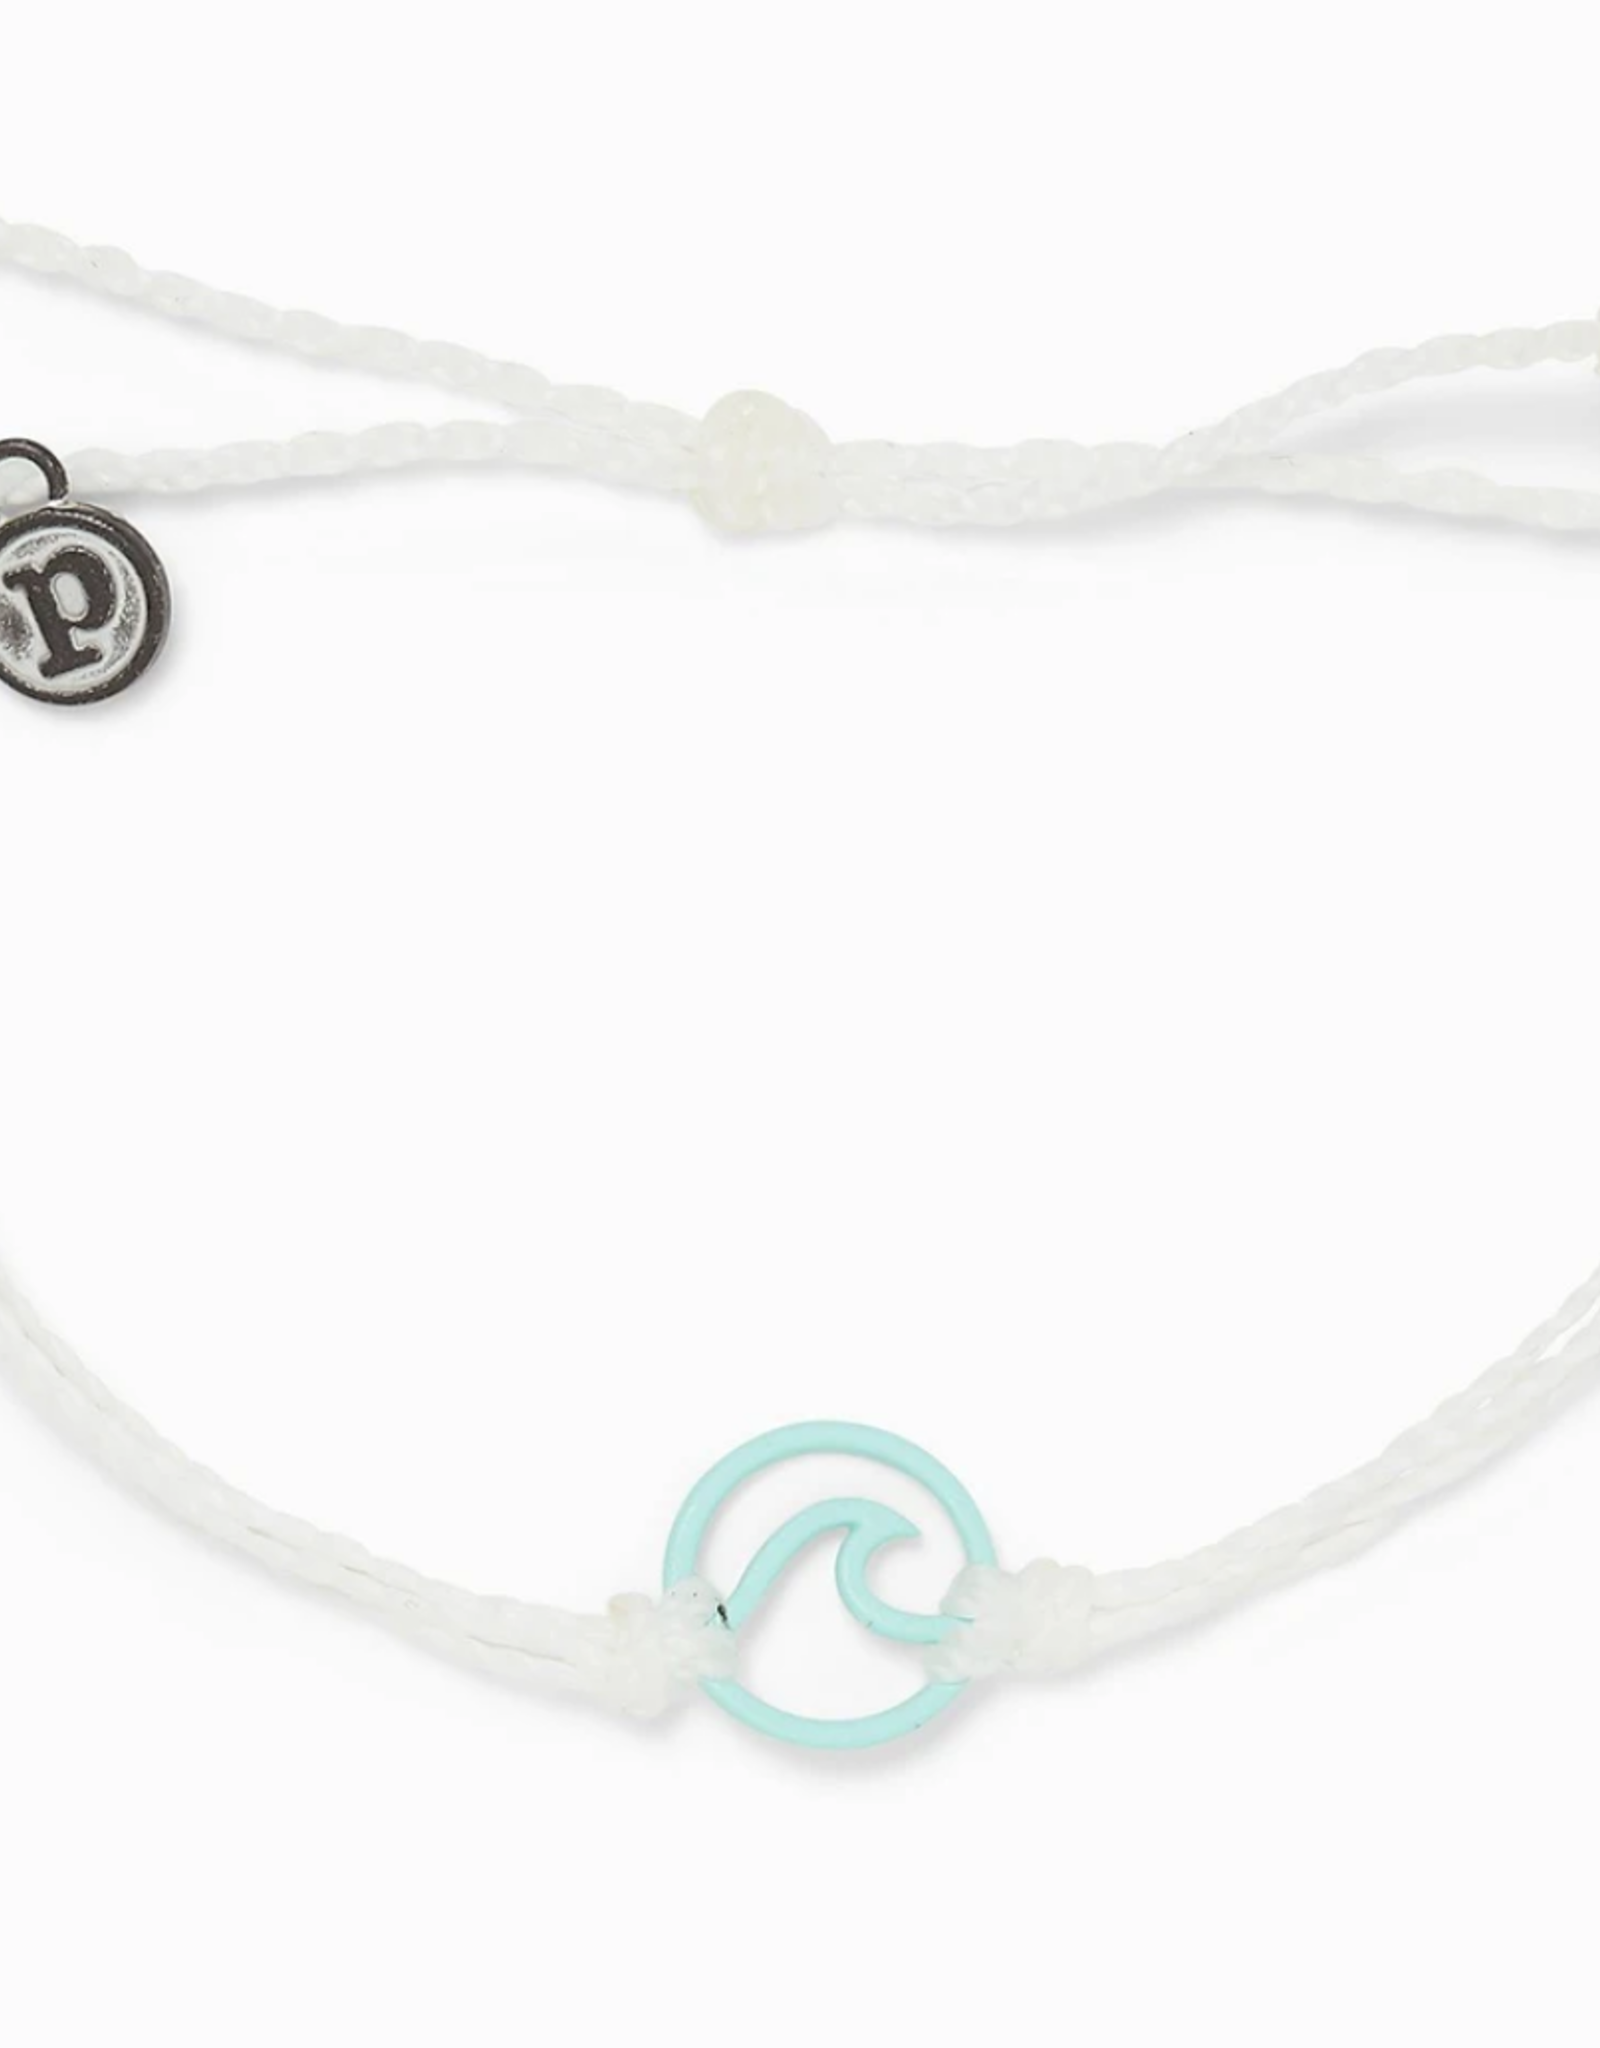 Puravida Pura Vida - Charm Bracelet Enamel Wave - White